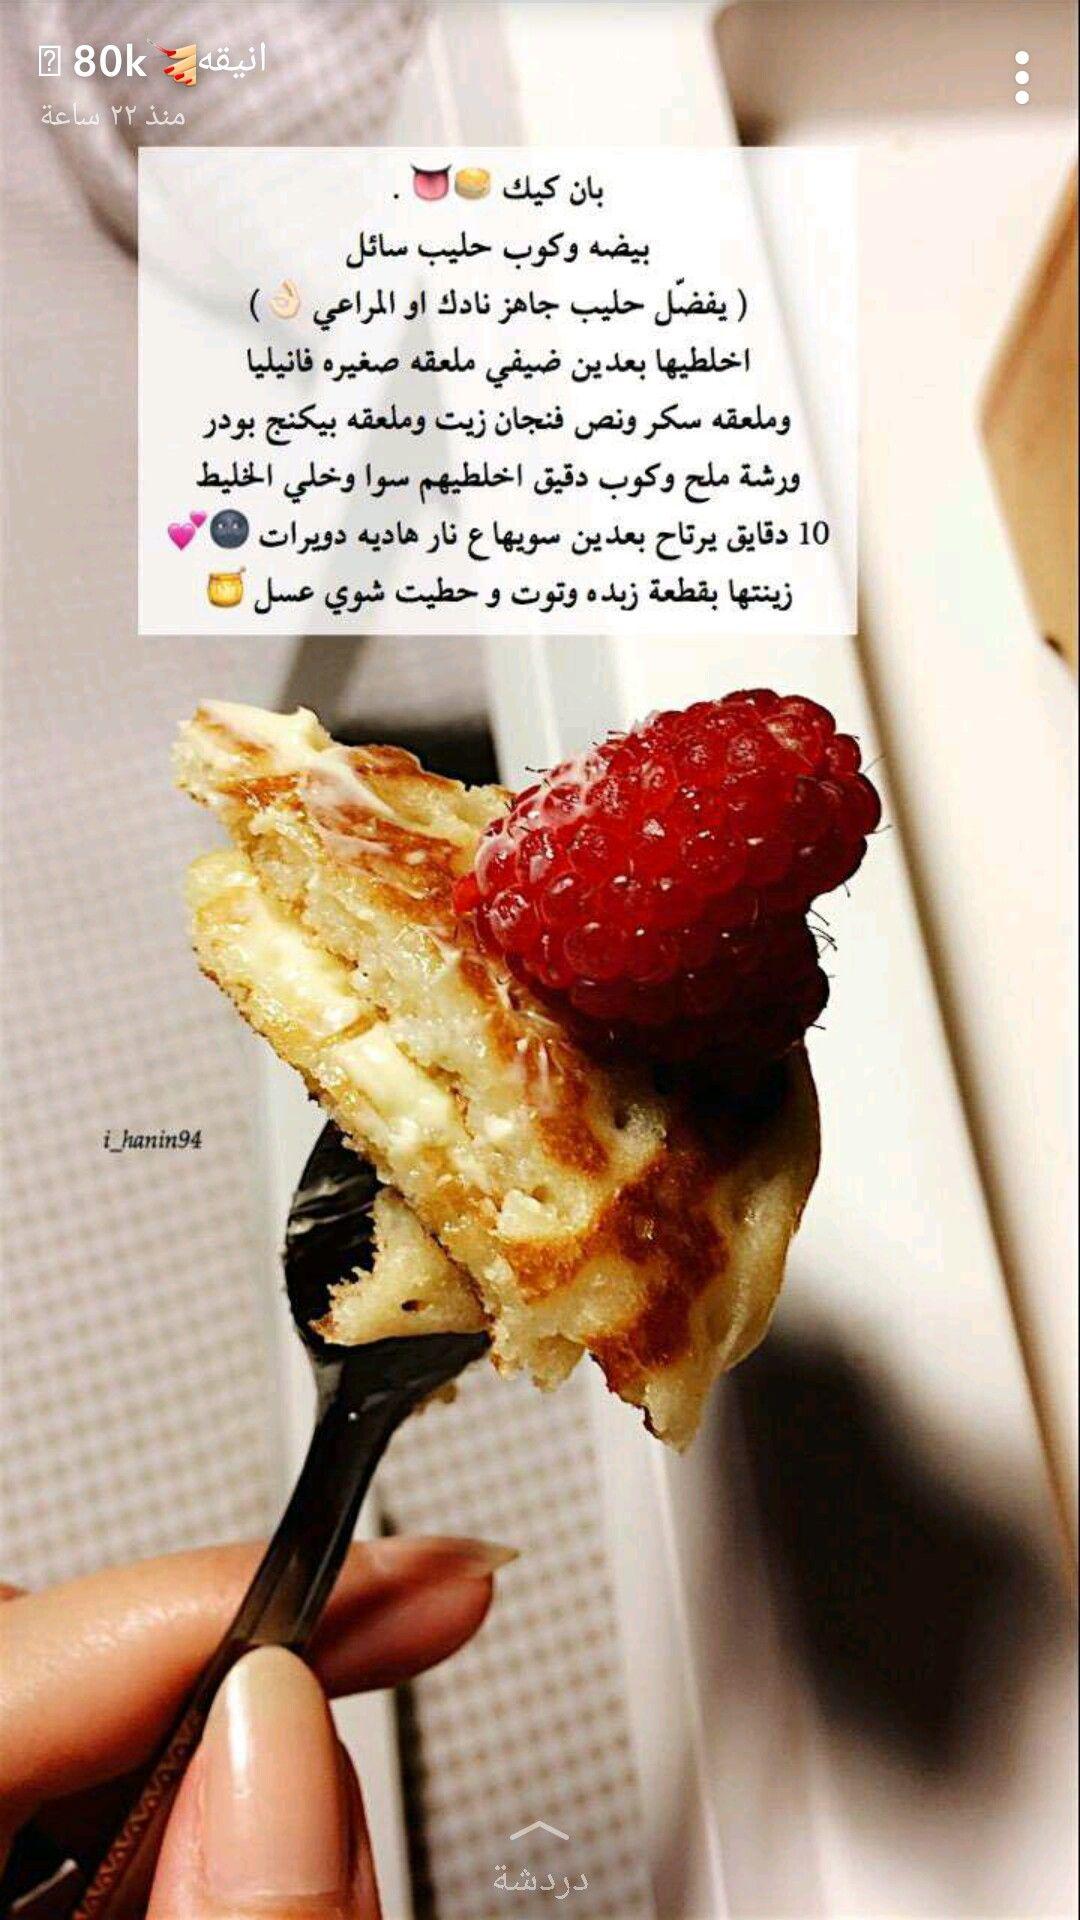 Pin By Lamq20 On حلى Libyan Food Food Cooking Recipes